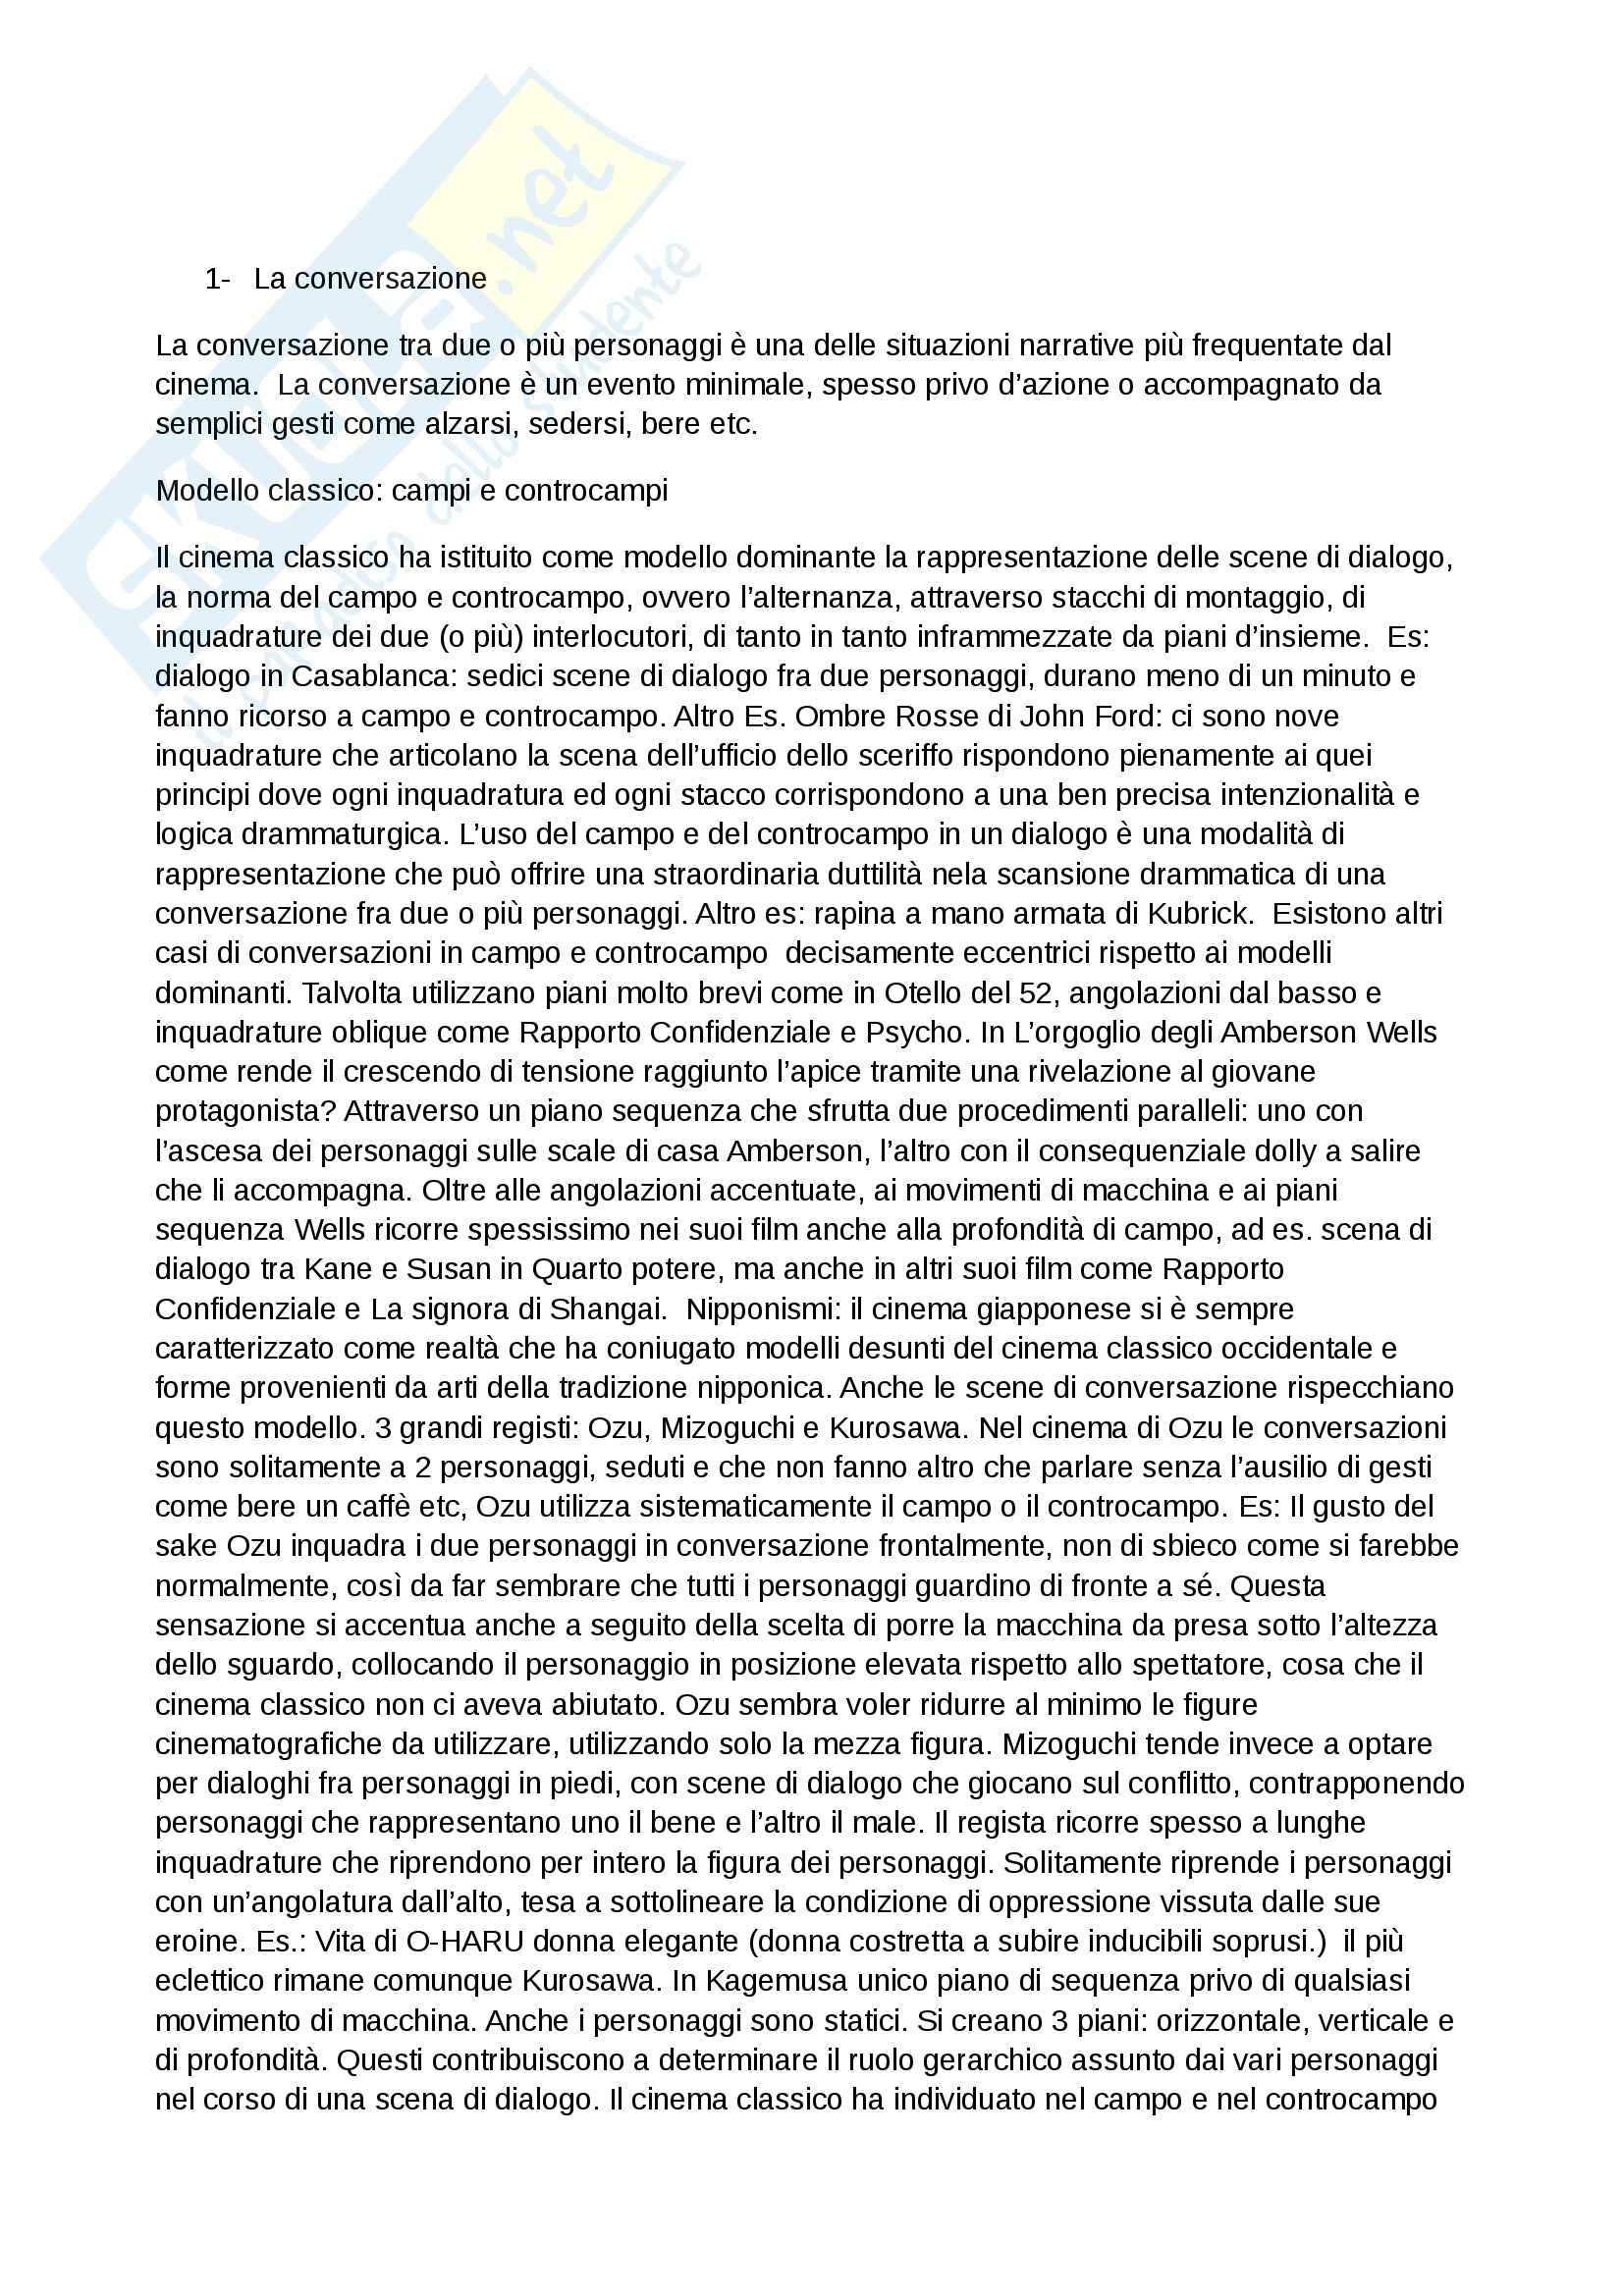 appunto D. Tomasi Storia del cinema